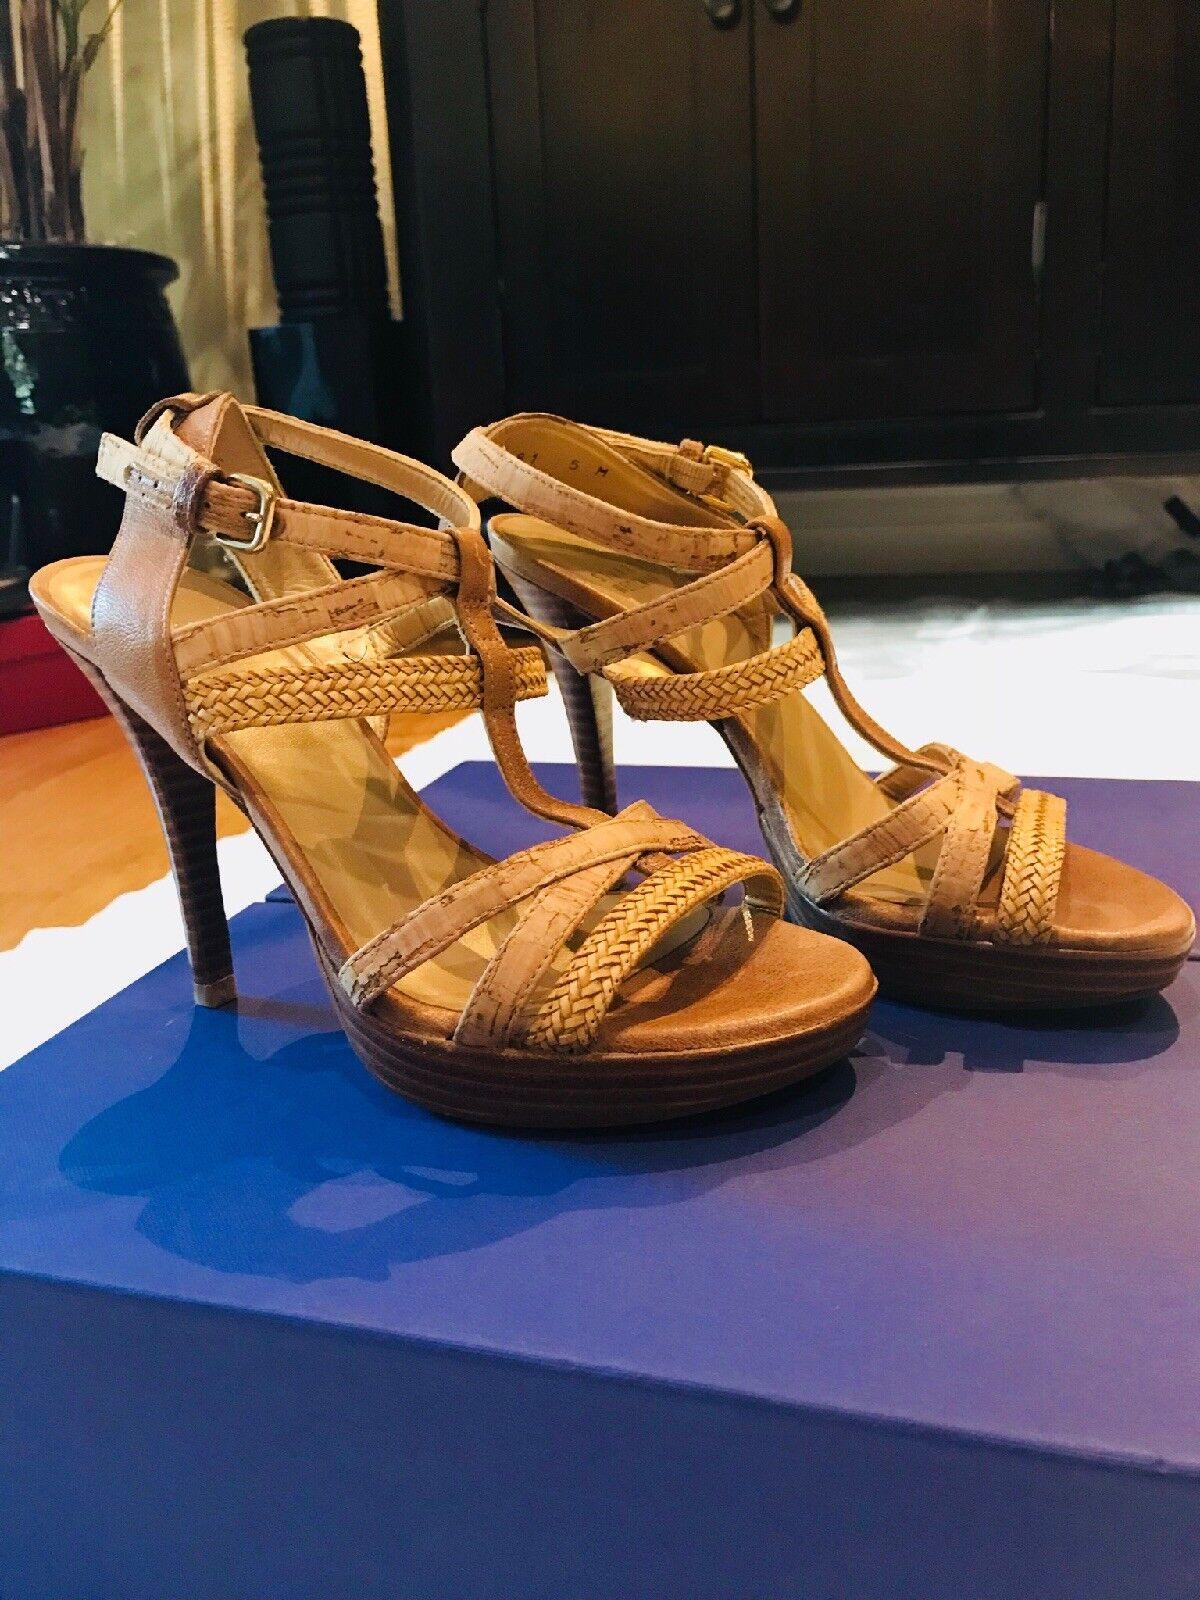 Strappy Tan Stuart Weitzman Size 5 sandal